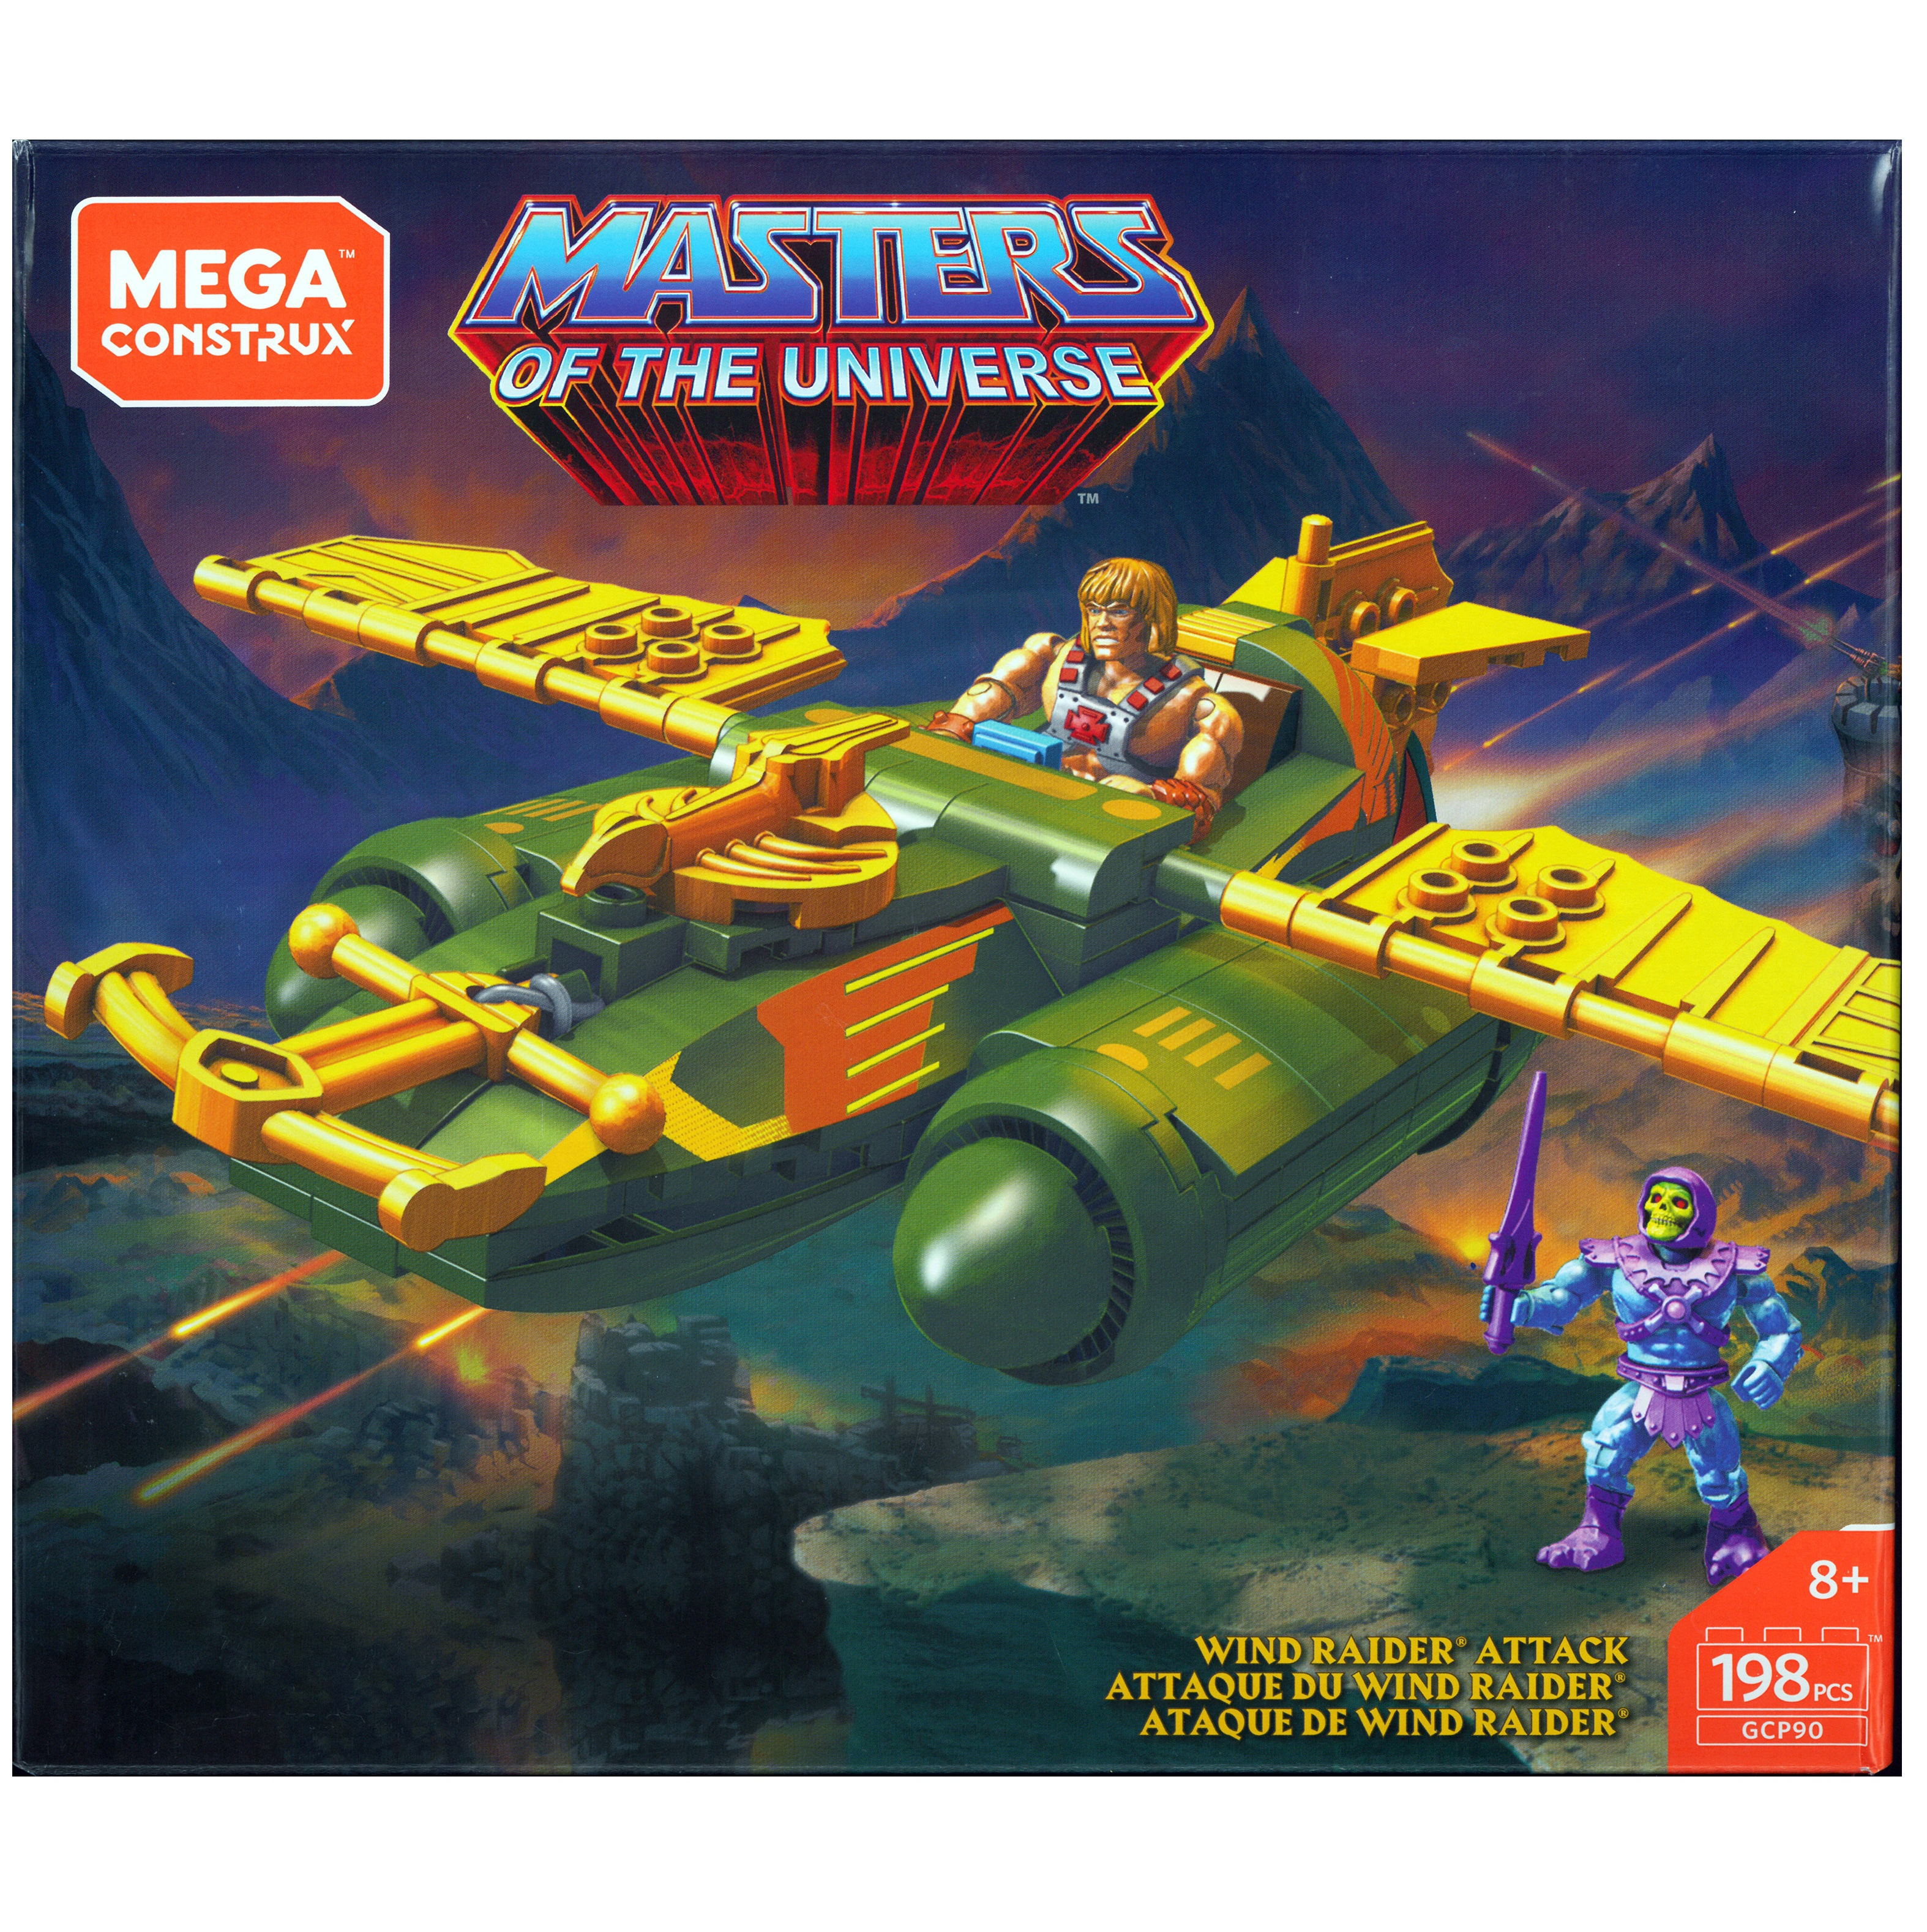 Masters of the Universe - Mega Construx: Wind Rider